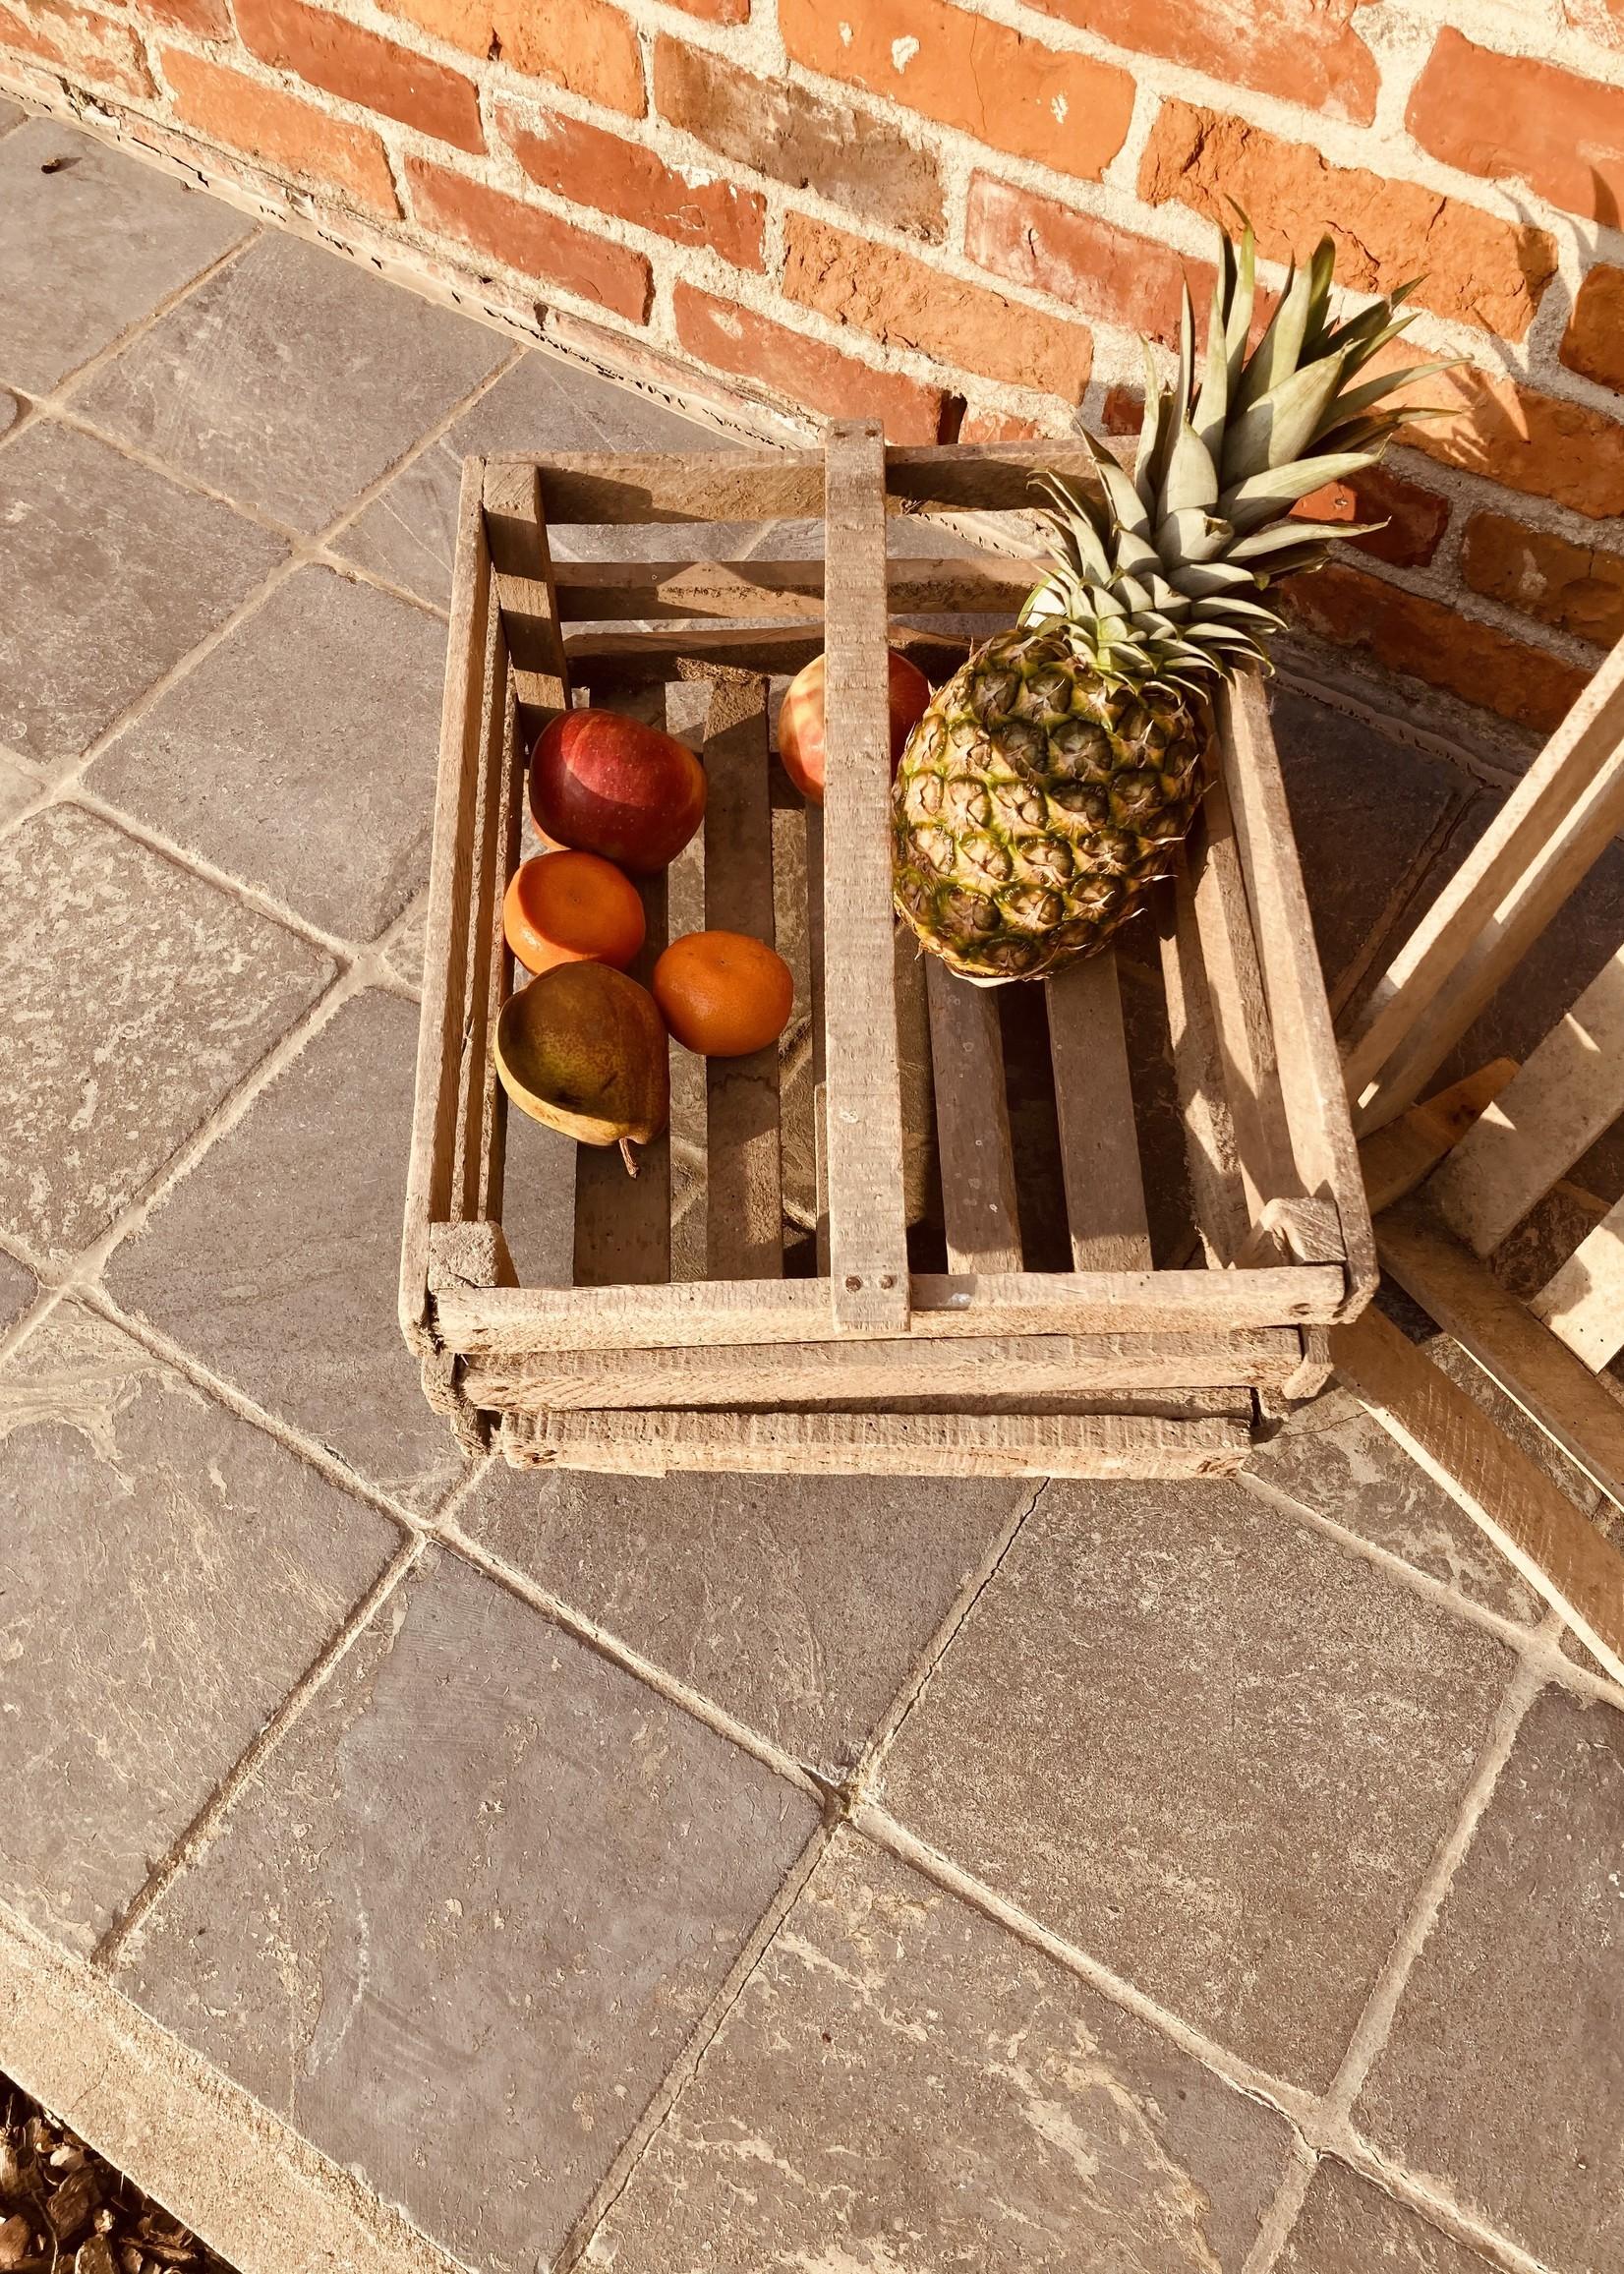 Wooden crat with handle